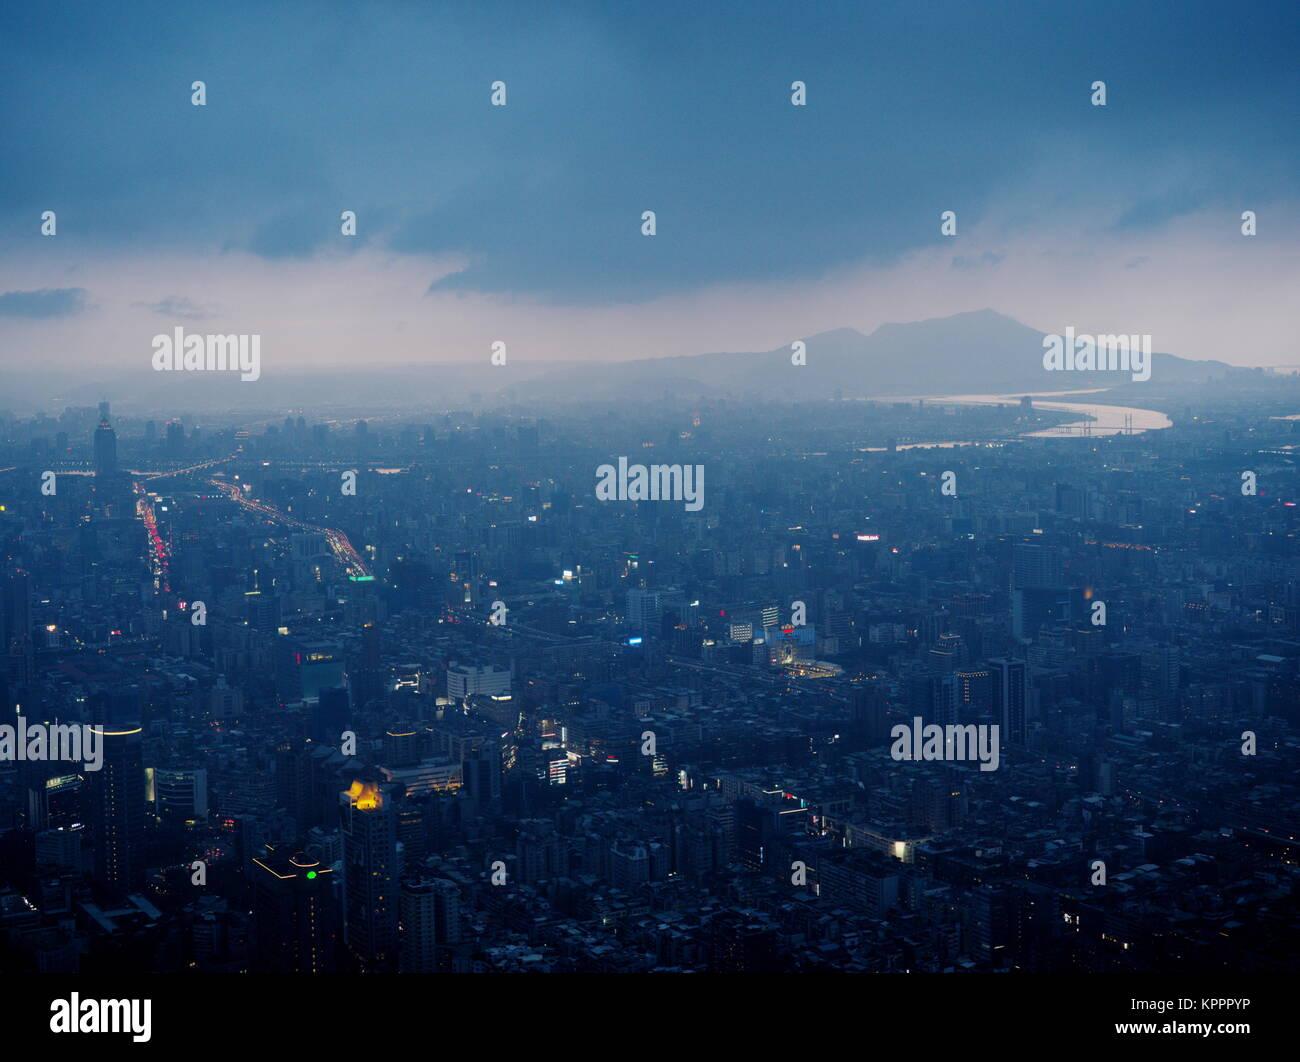 Viewing Taipei's skyline from 101 at dusk, Taiwan - Stock Image